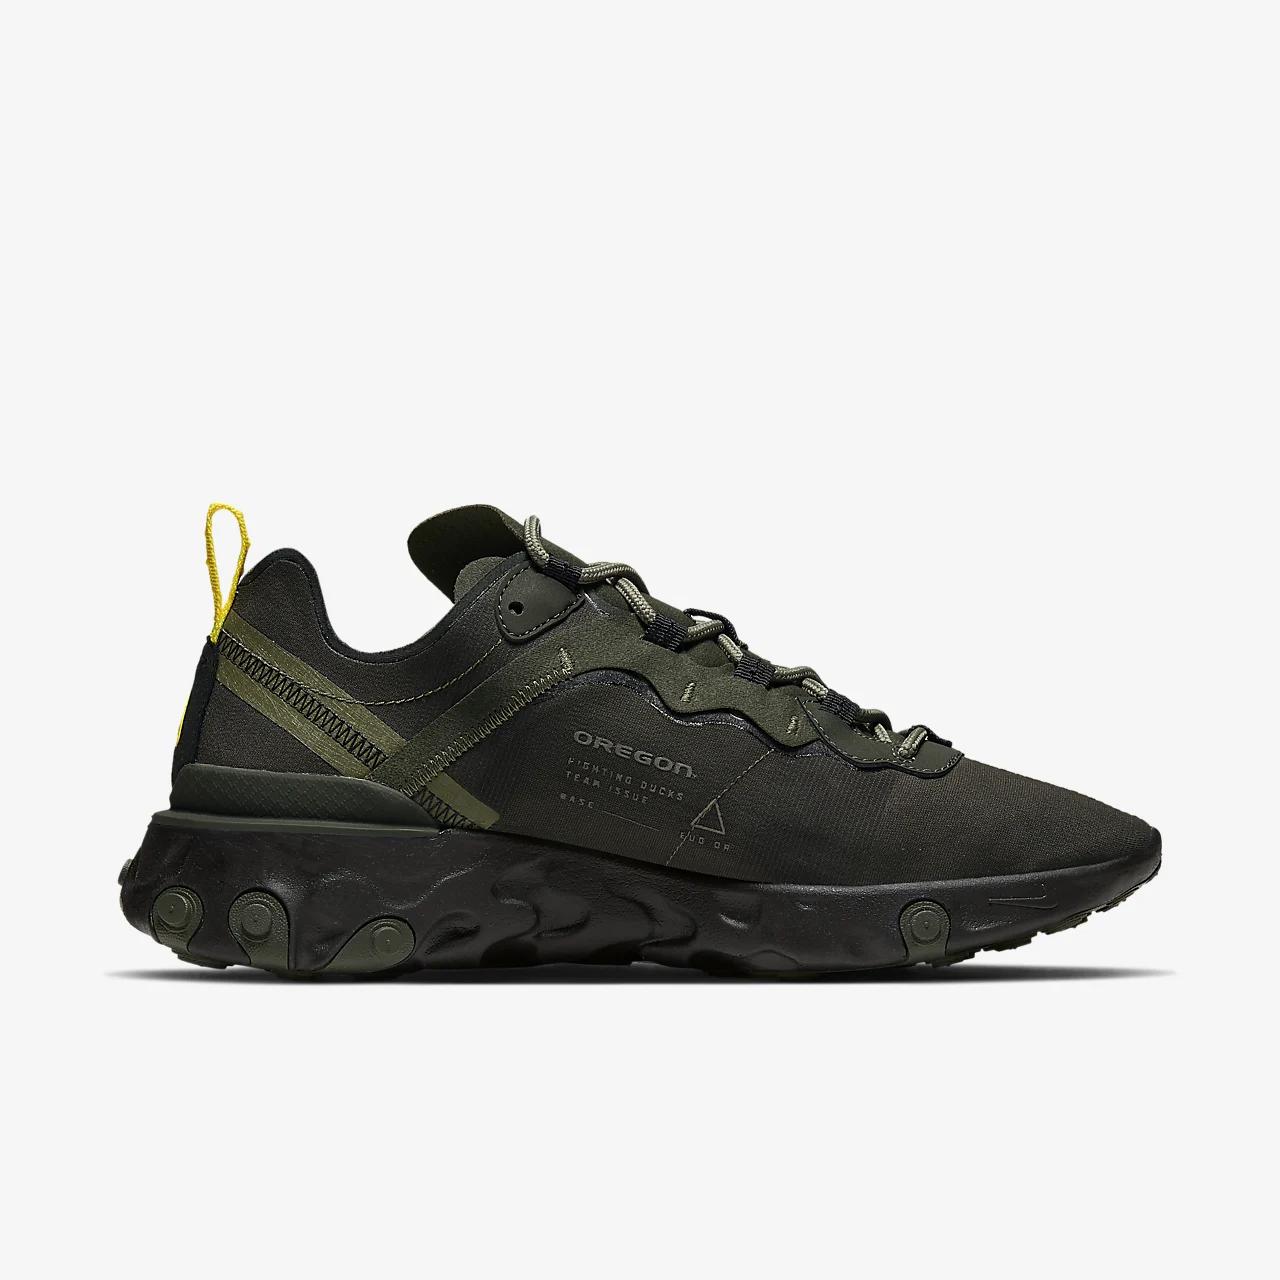 Nike React Element 55 (Oregon) Men's Shoe CK4797-300